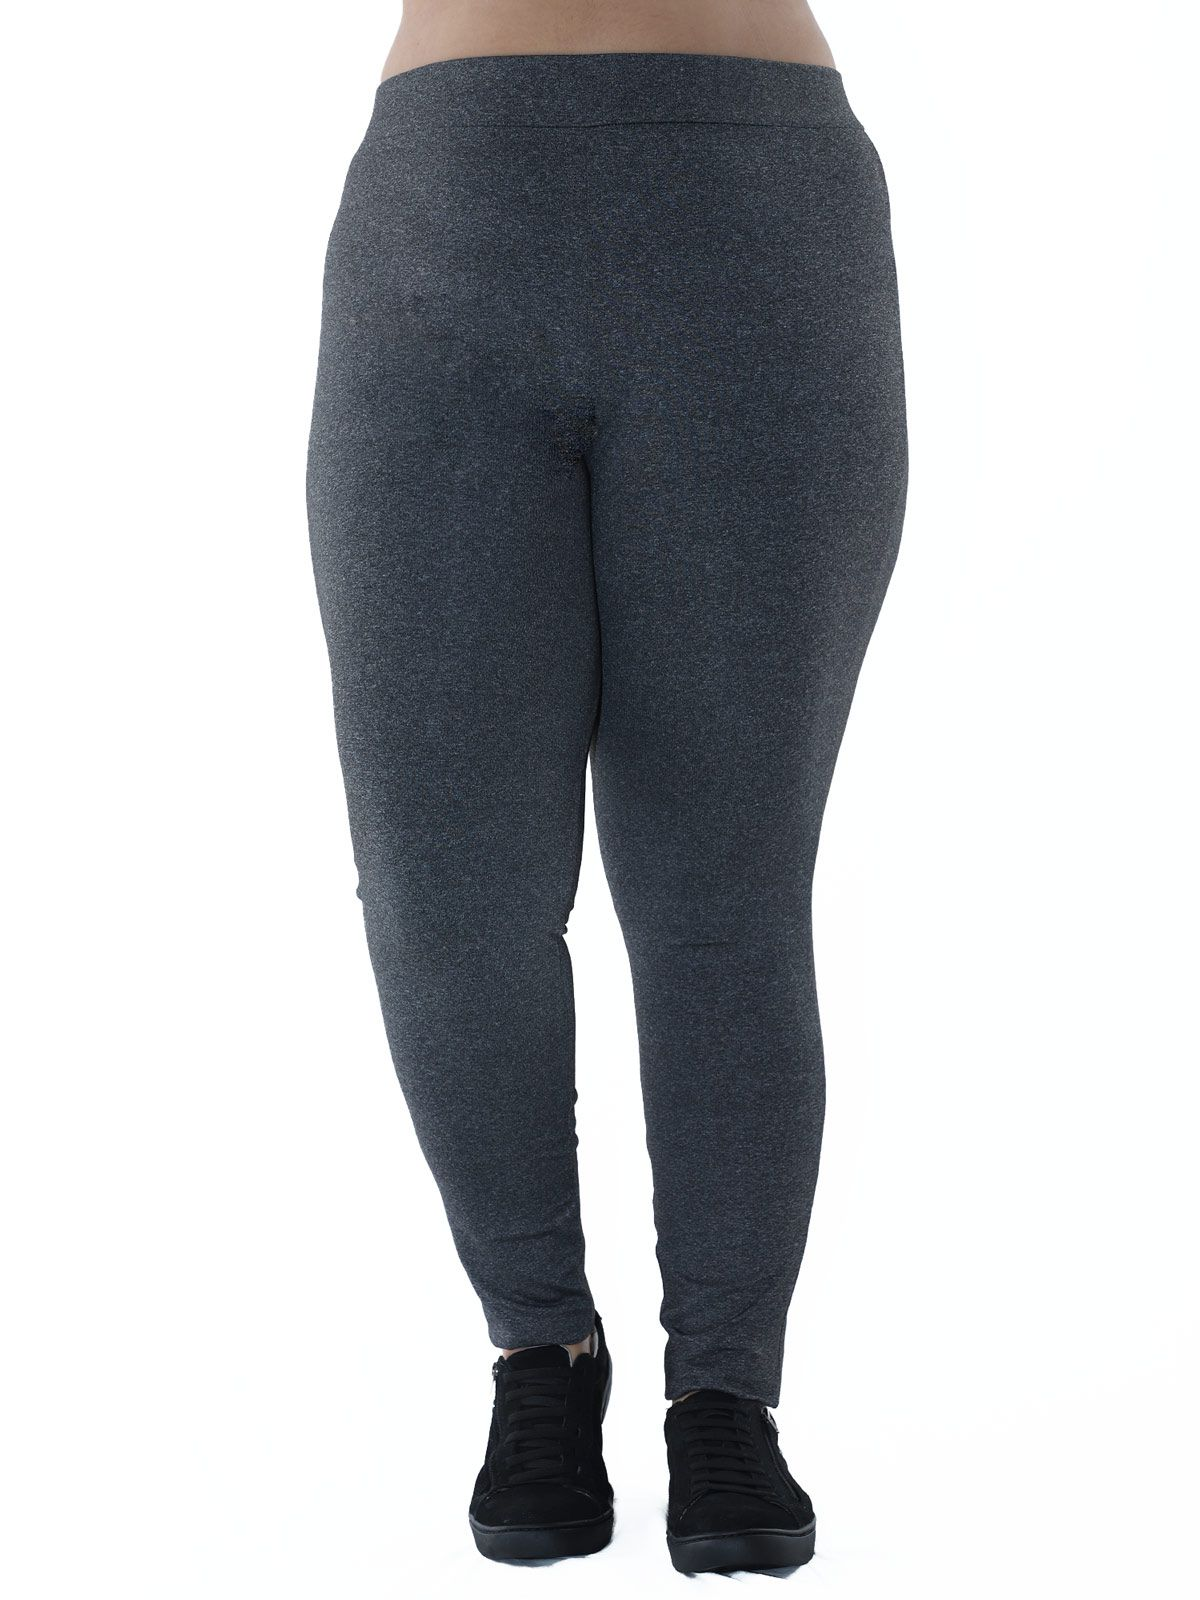 Calça Legging Plus Size Fitness KTS Mescla Preto